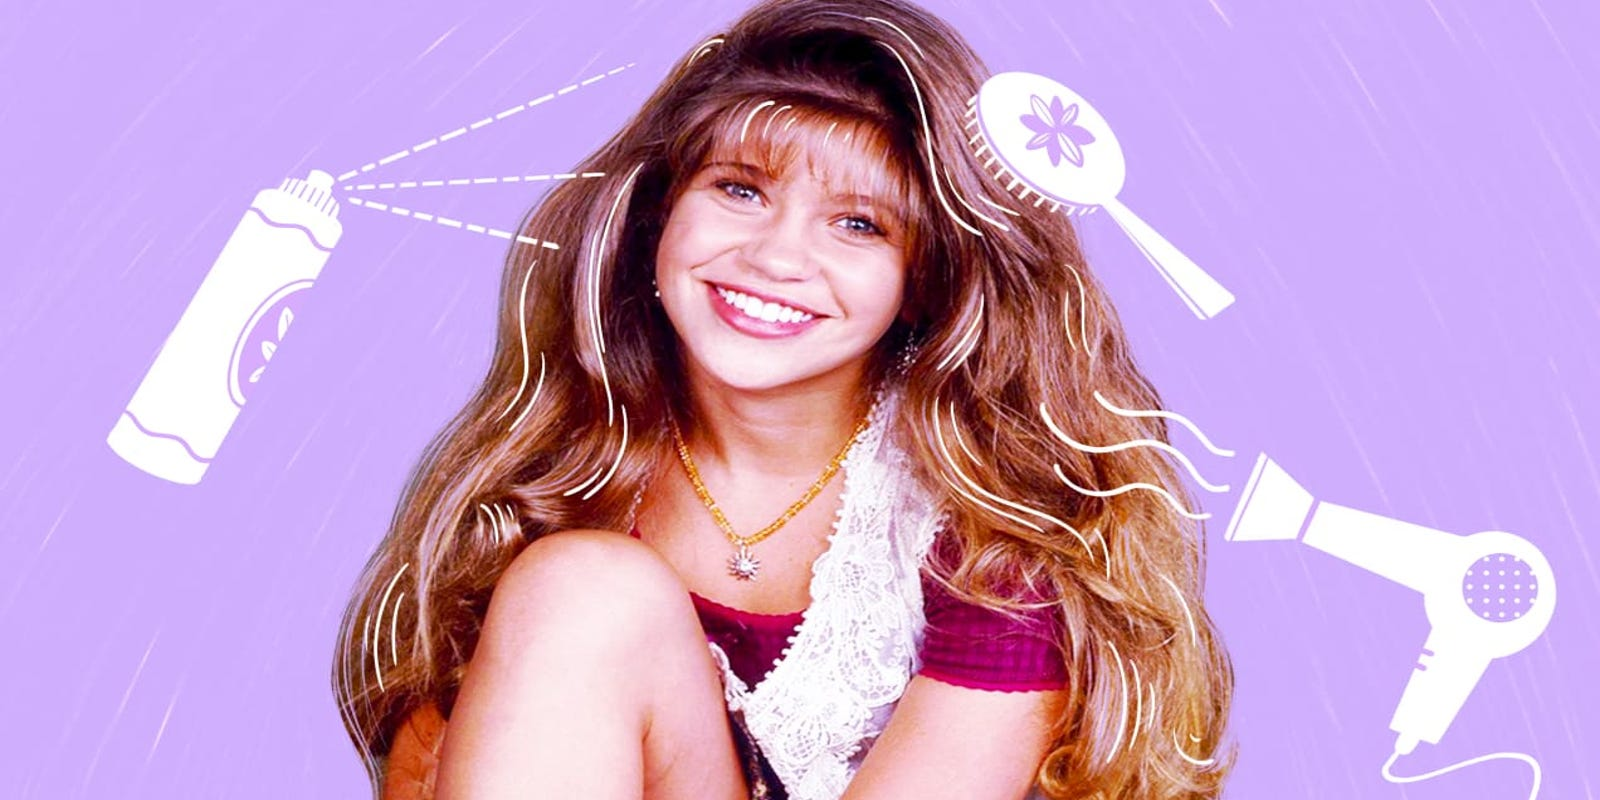 Boy Meets World's Danielle Fishel shares her secrets to Topanga hair